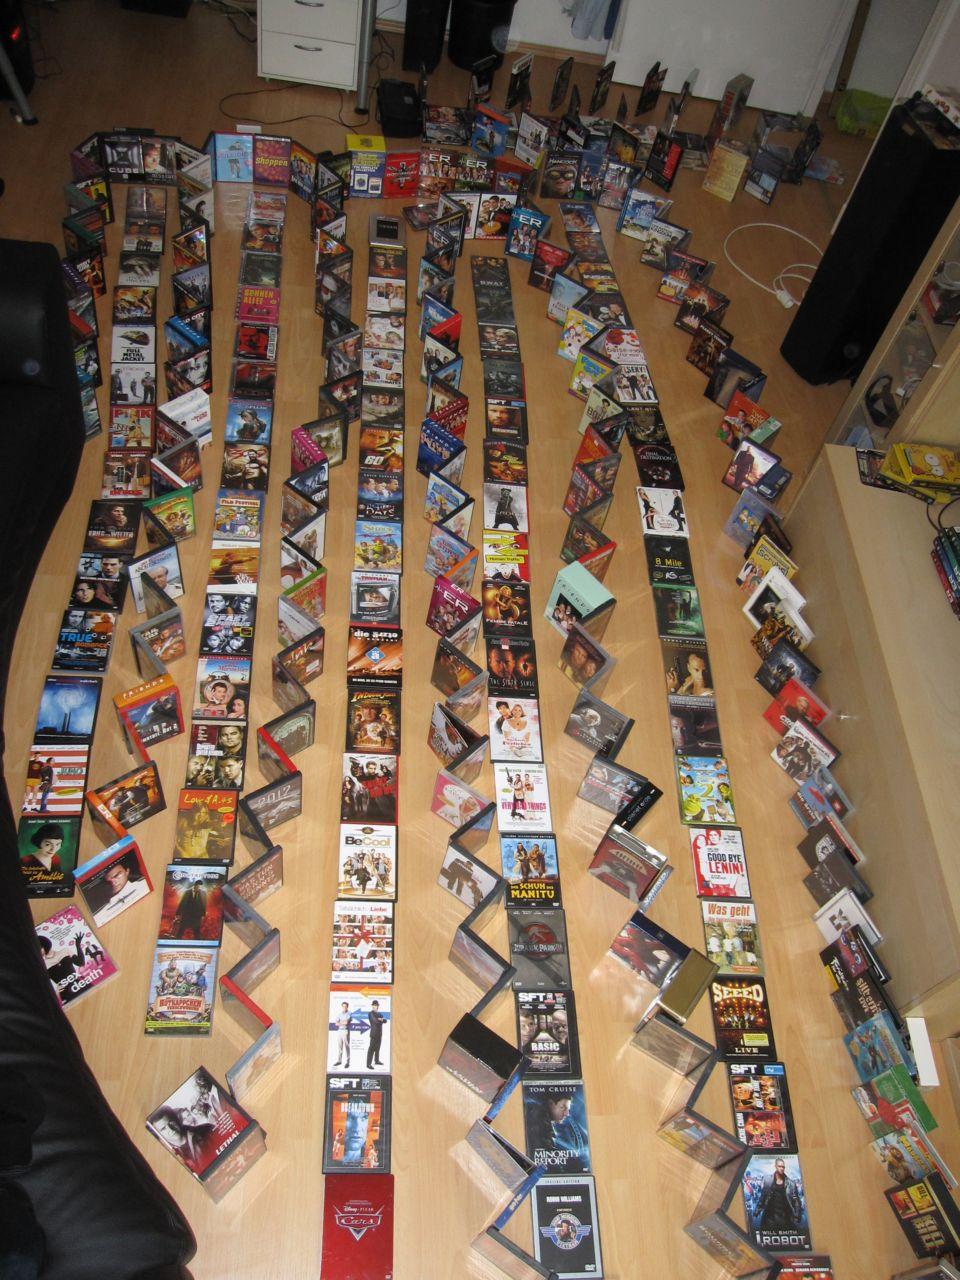 DVDs DVDs DVDs... wo ist der Ausgang?